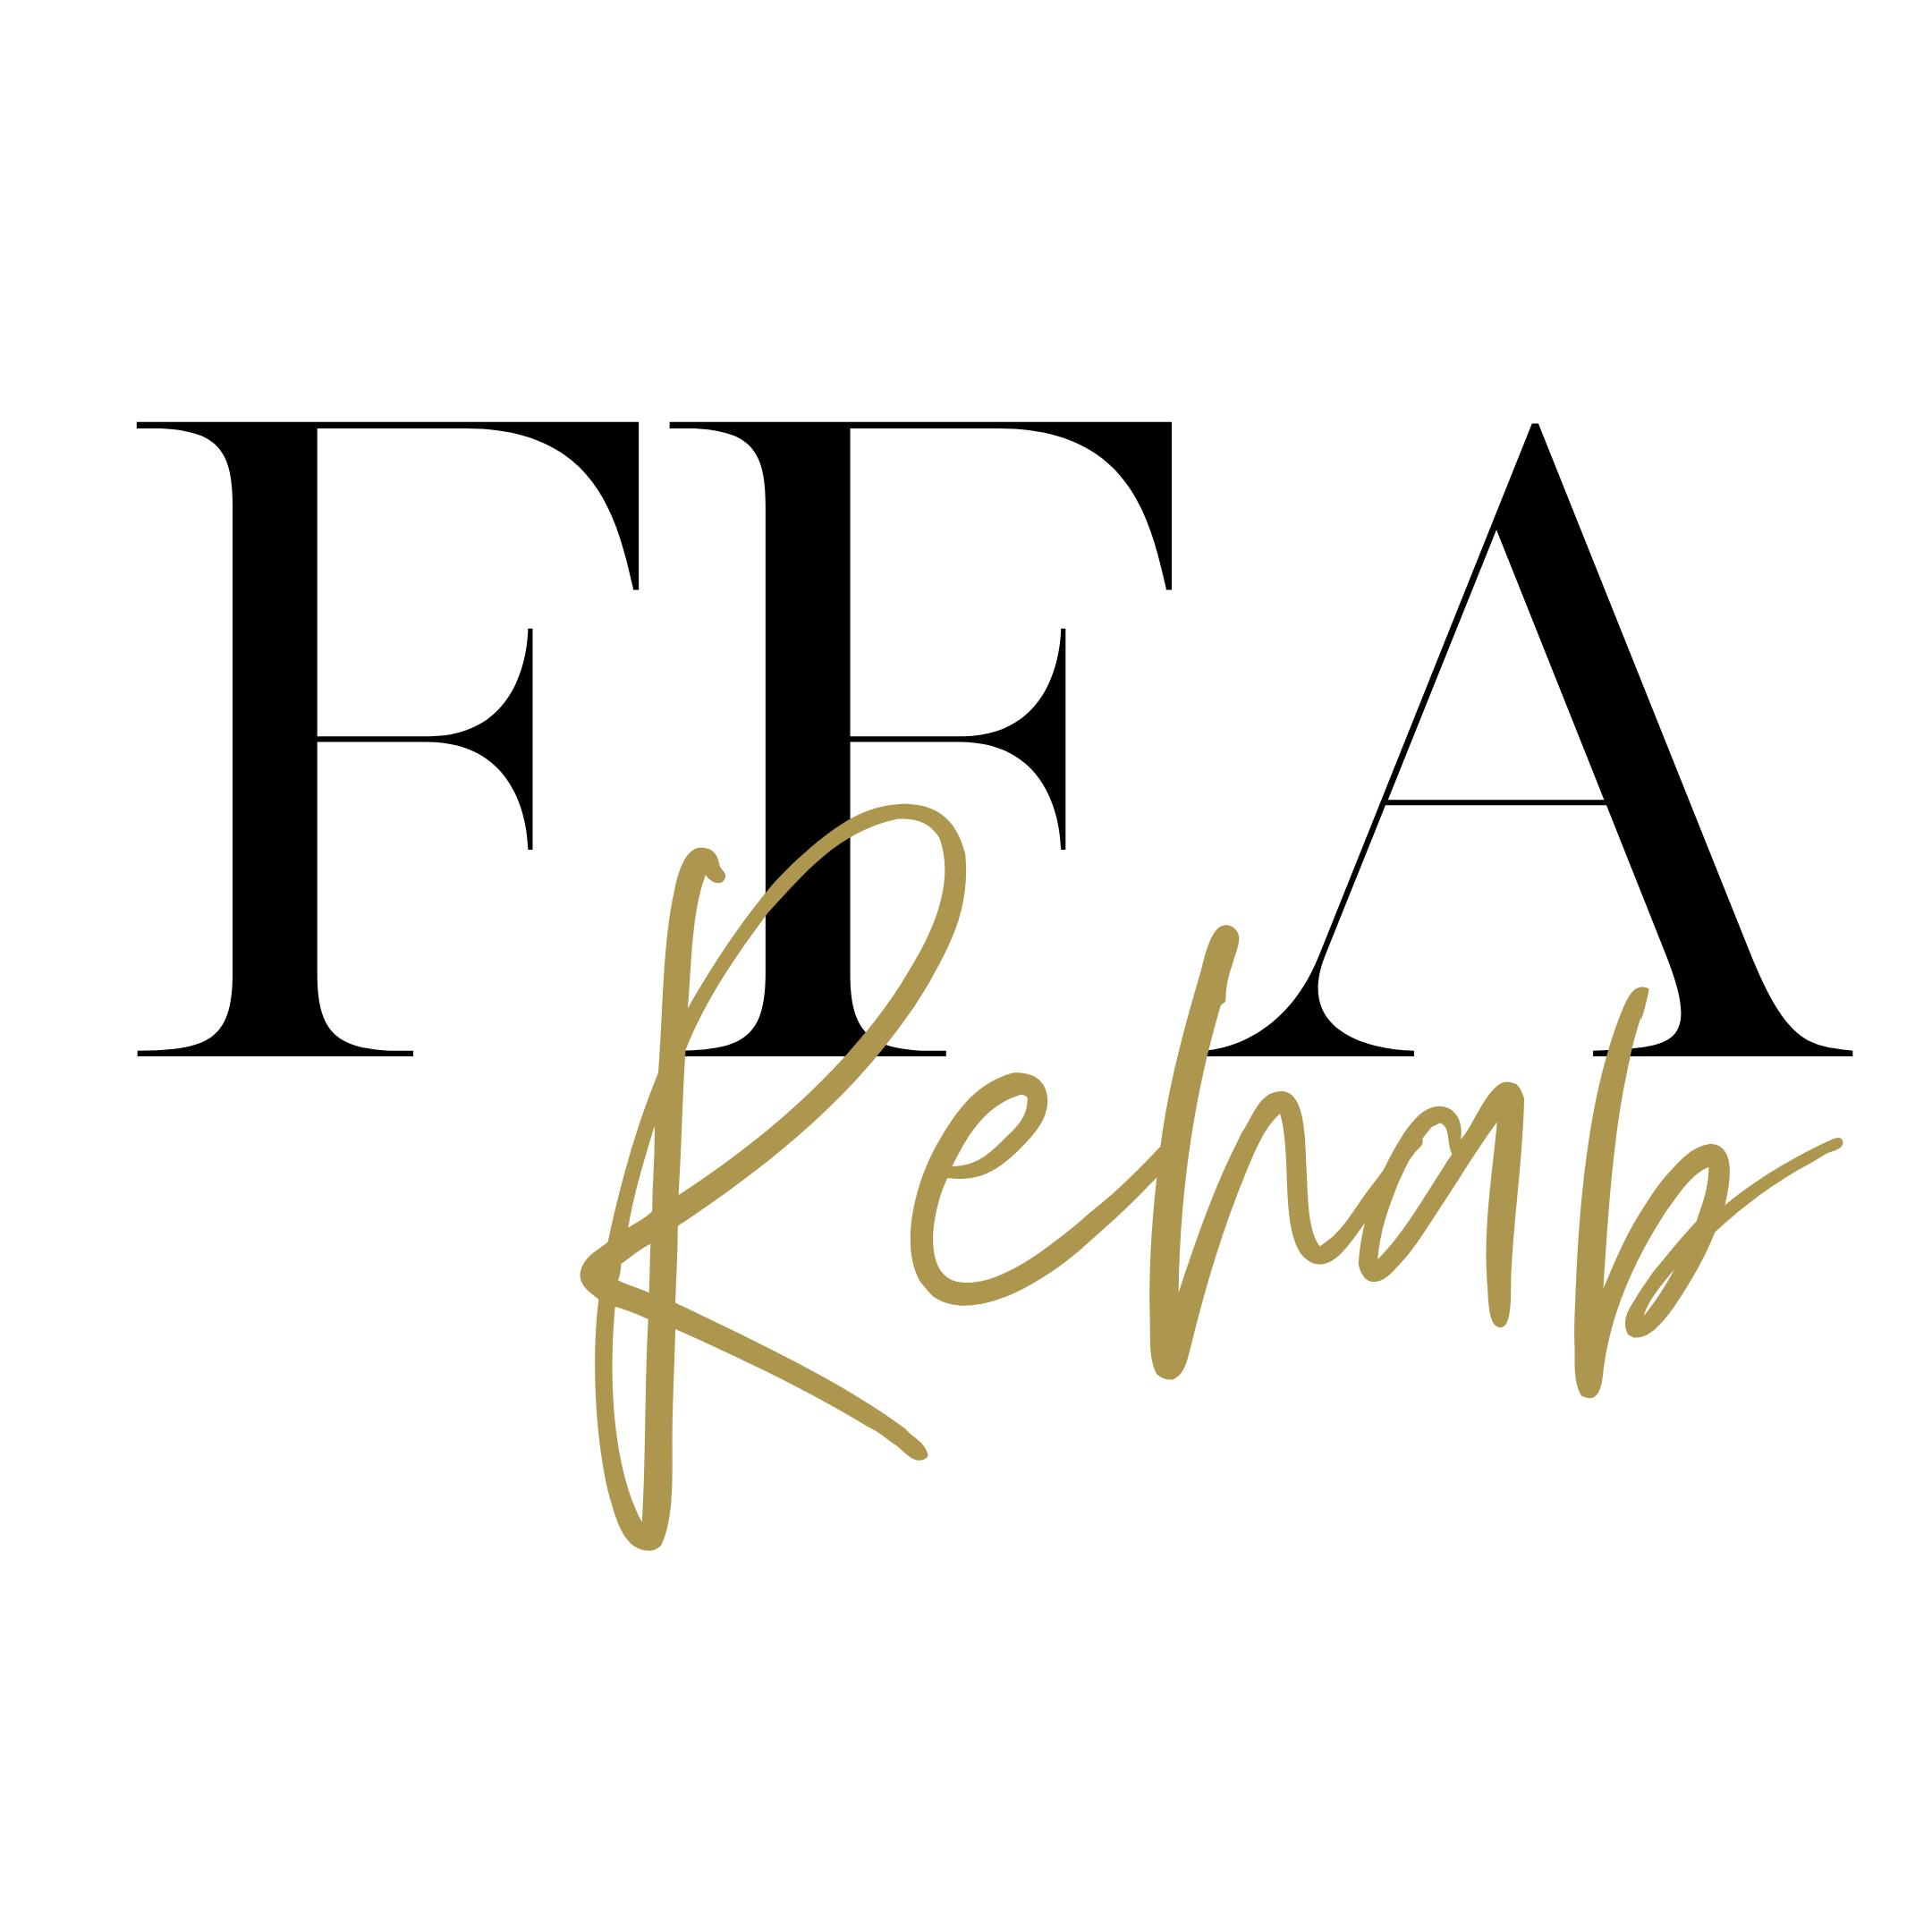 Category - FFA Rehab